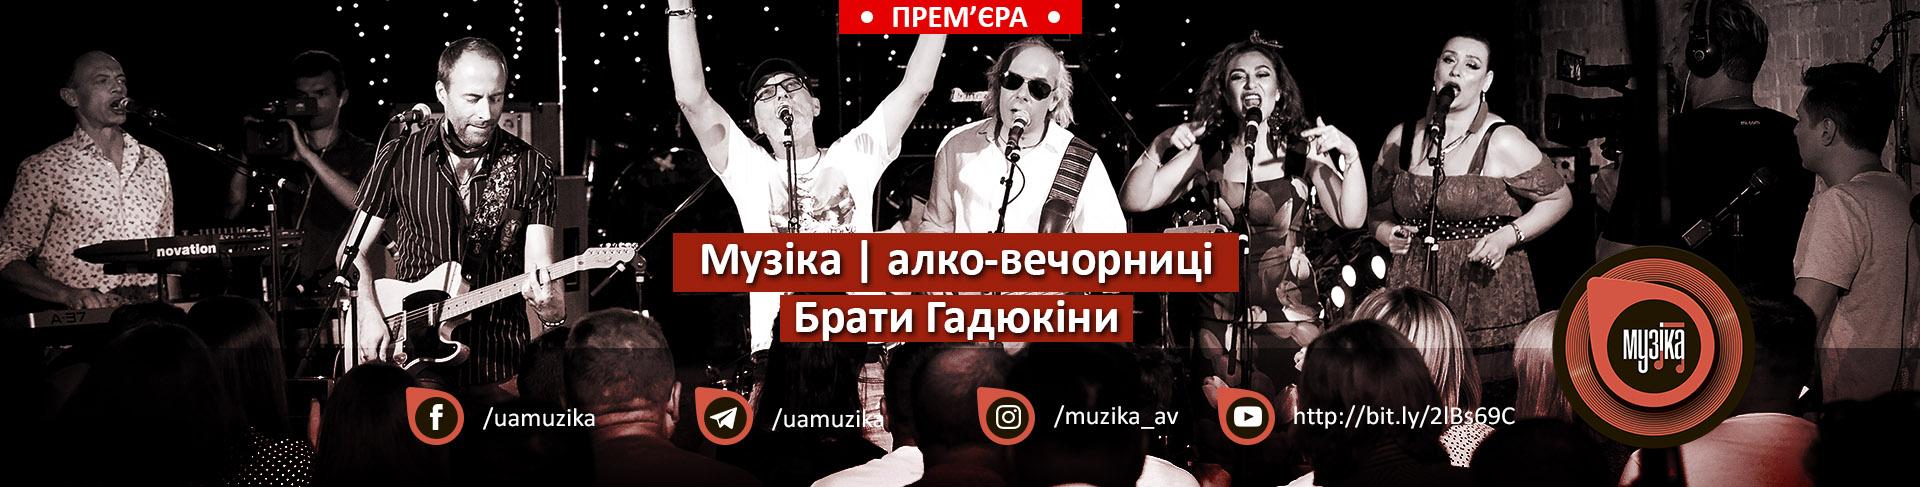 "МУЗИКА | алко-вечеринки"": группа Браья Гадюкини"